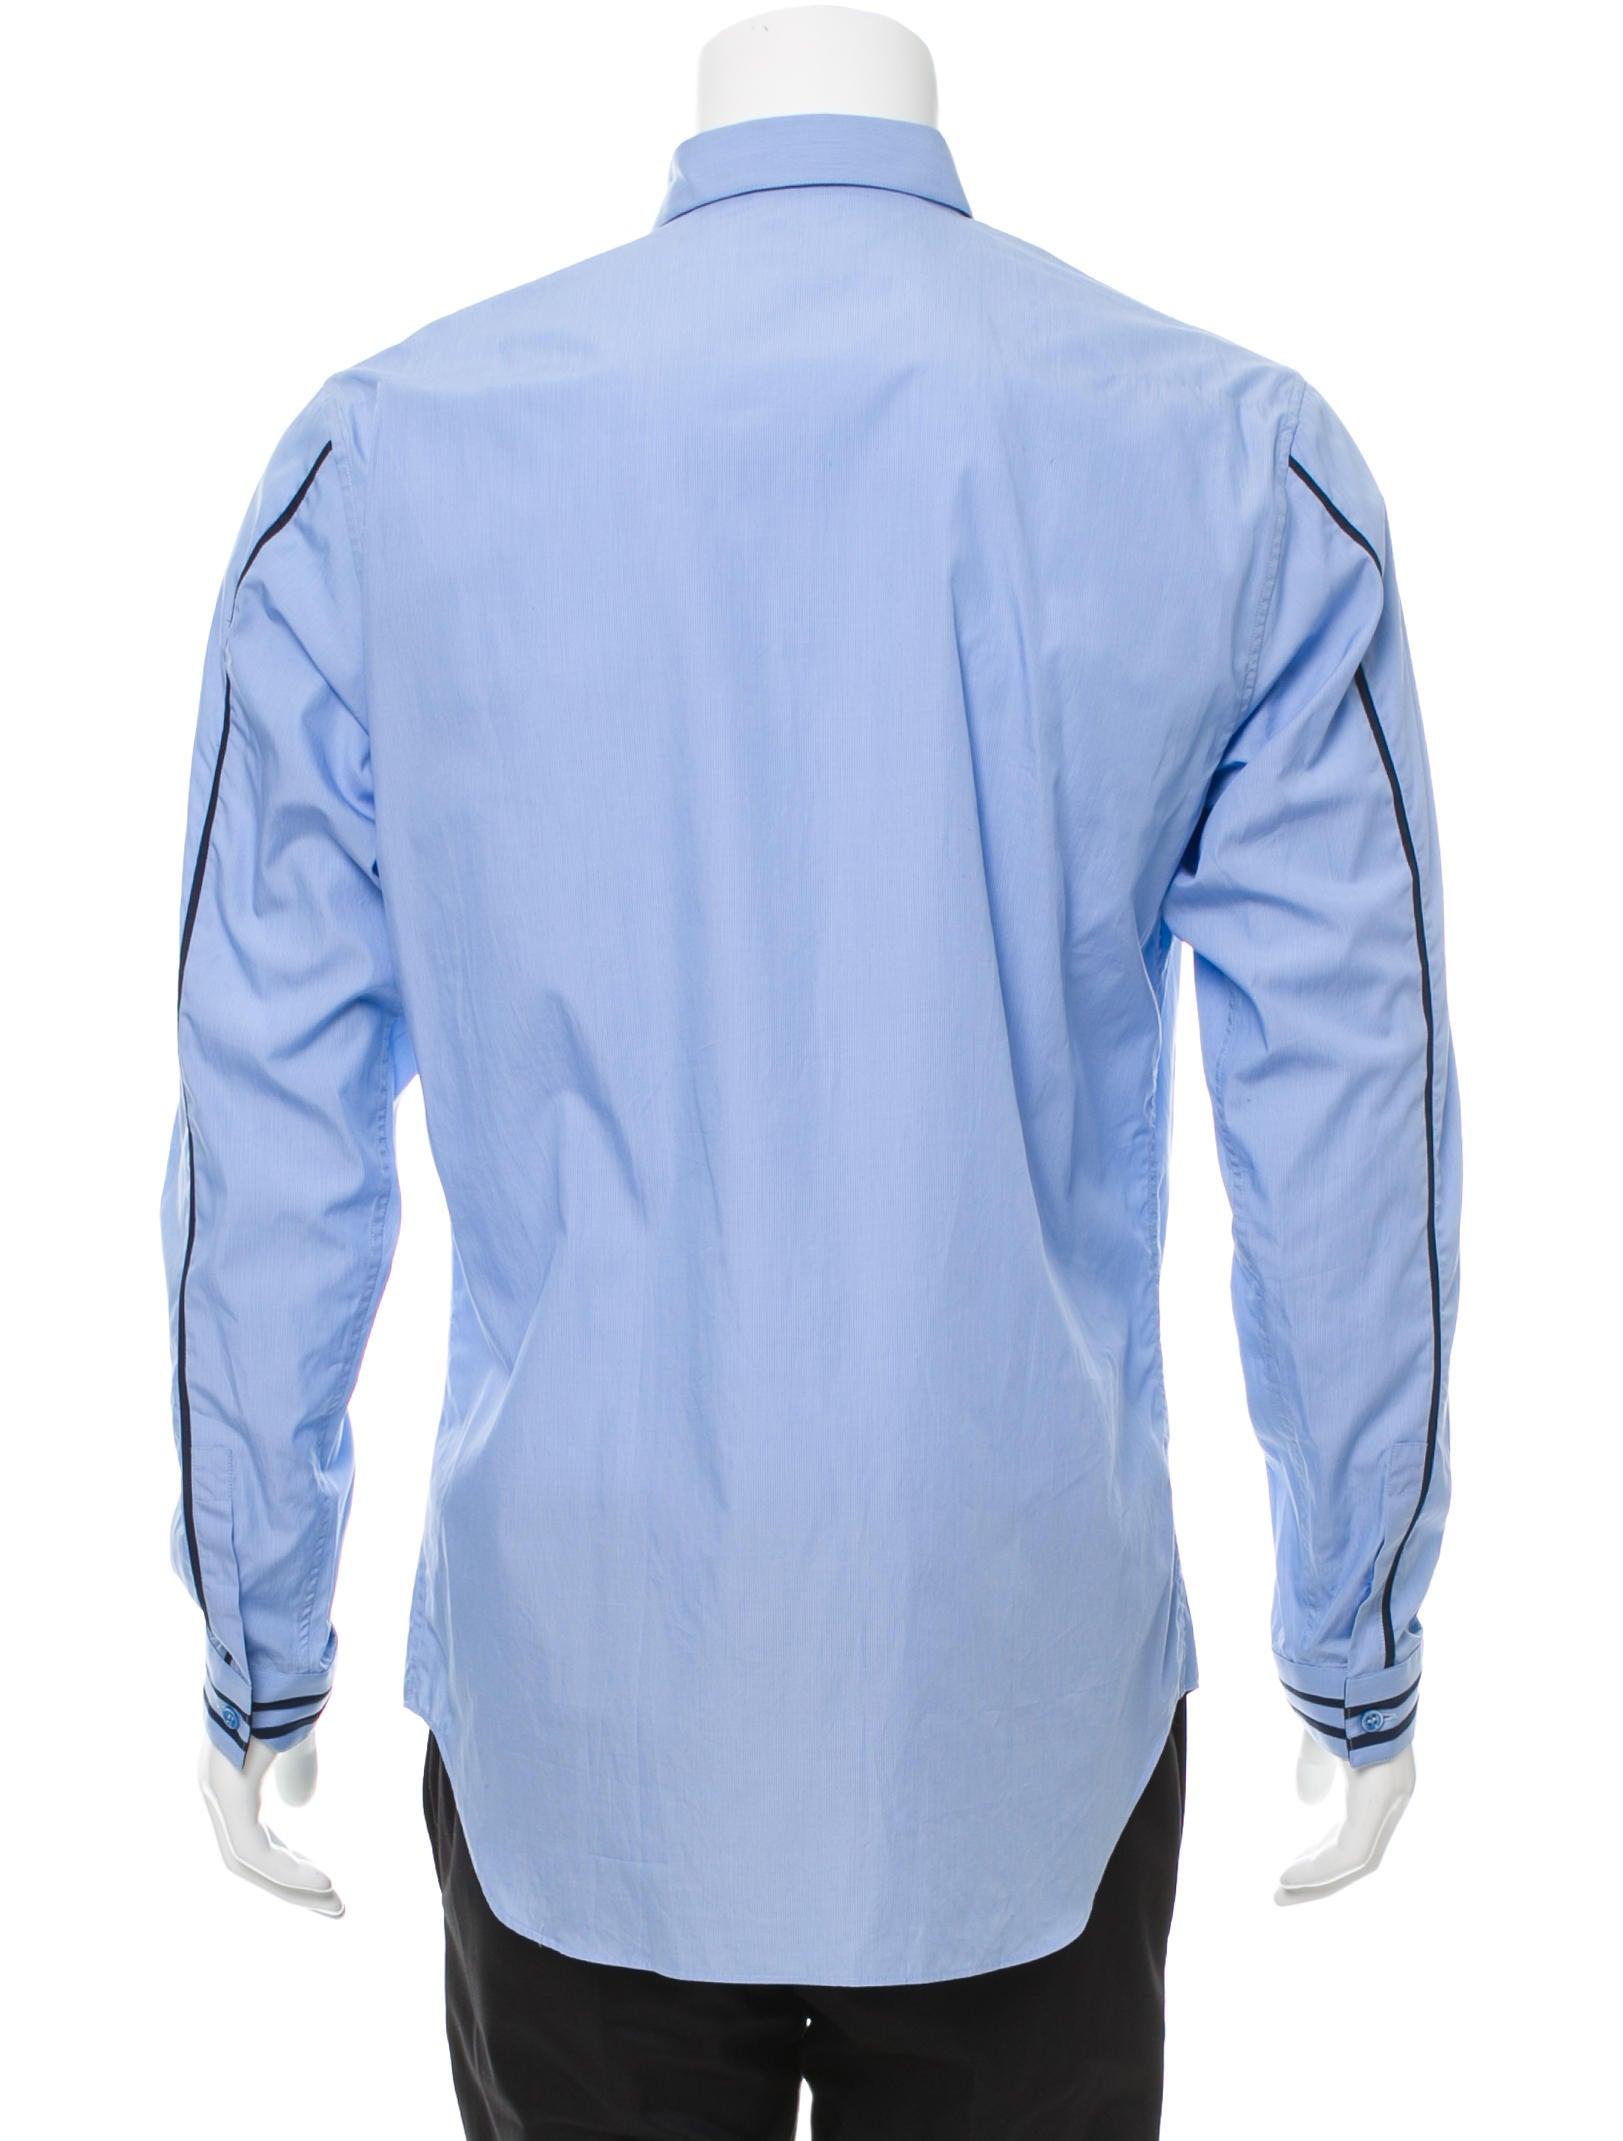 Dior Homme Pinstripe Button Up Shirt Clothing Hmm22856